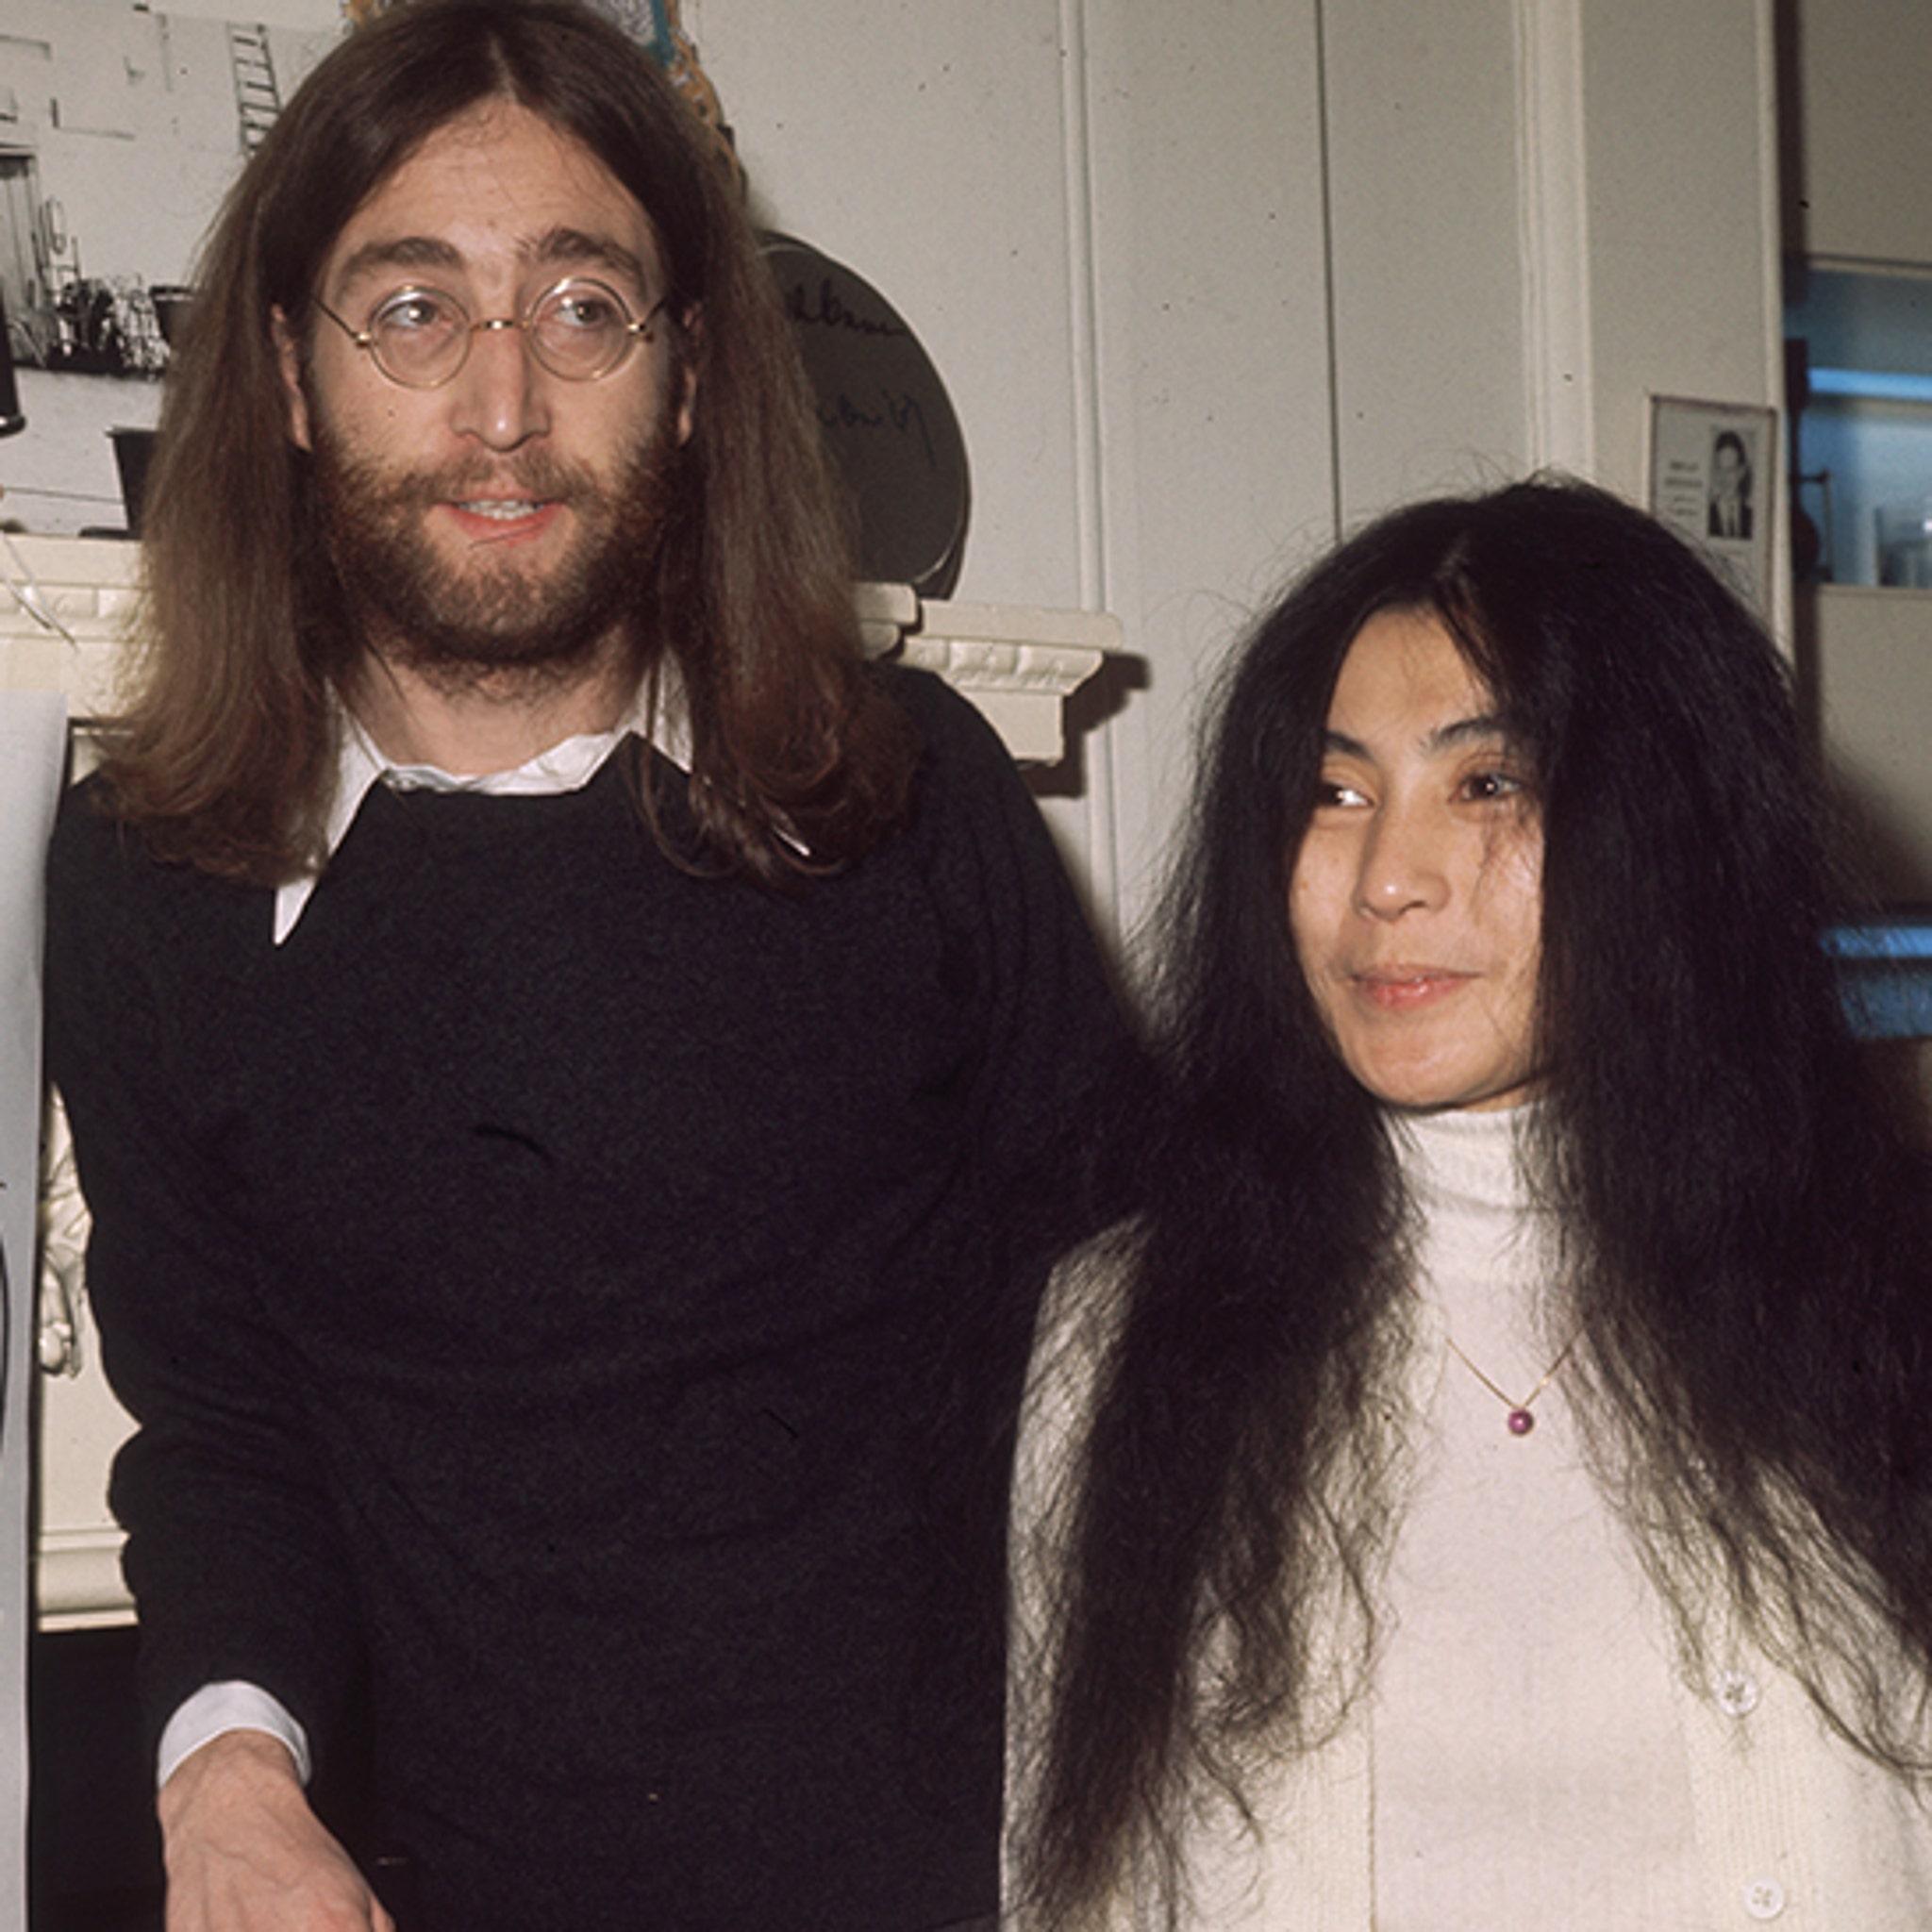 John Lennon S Christmas Card To Yoko Ono S Ex For Sale